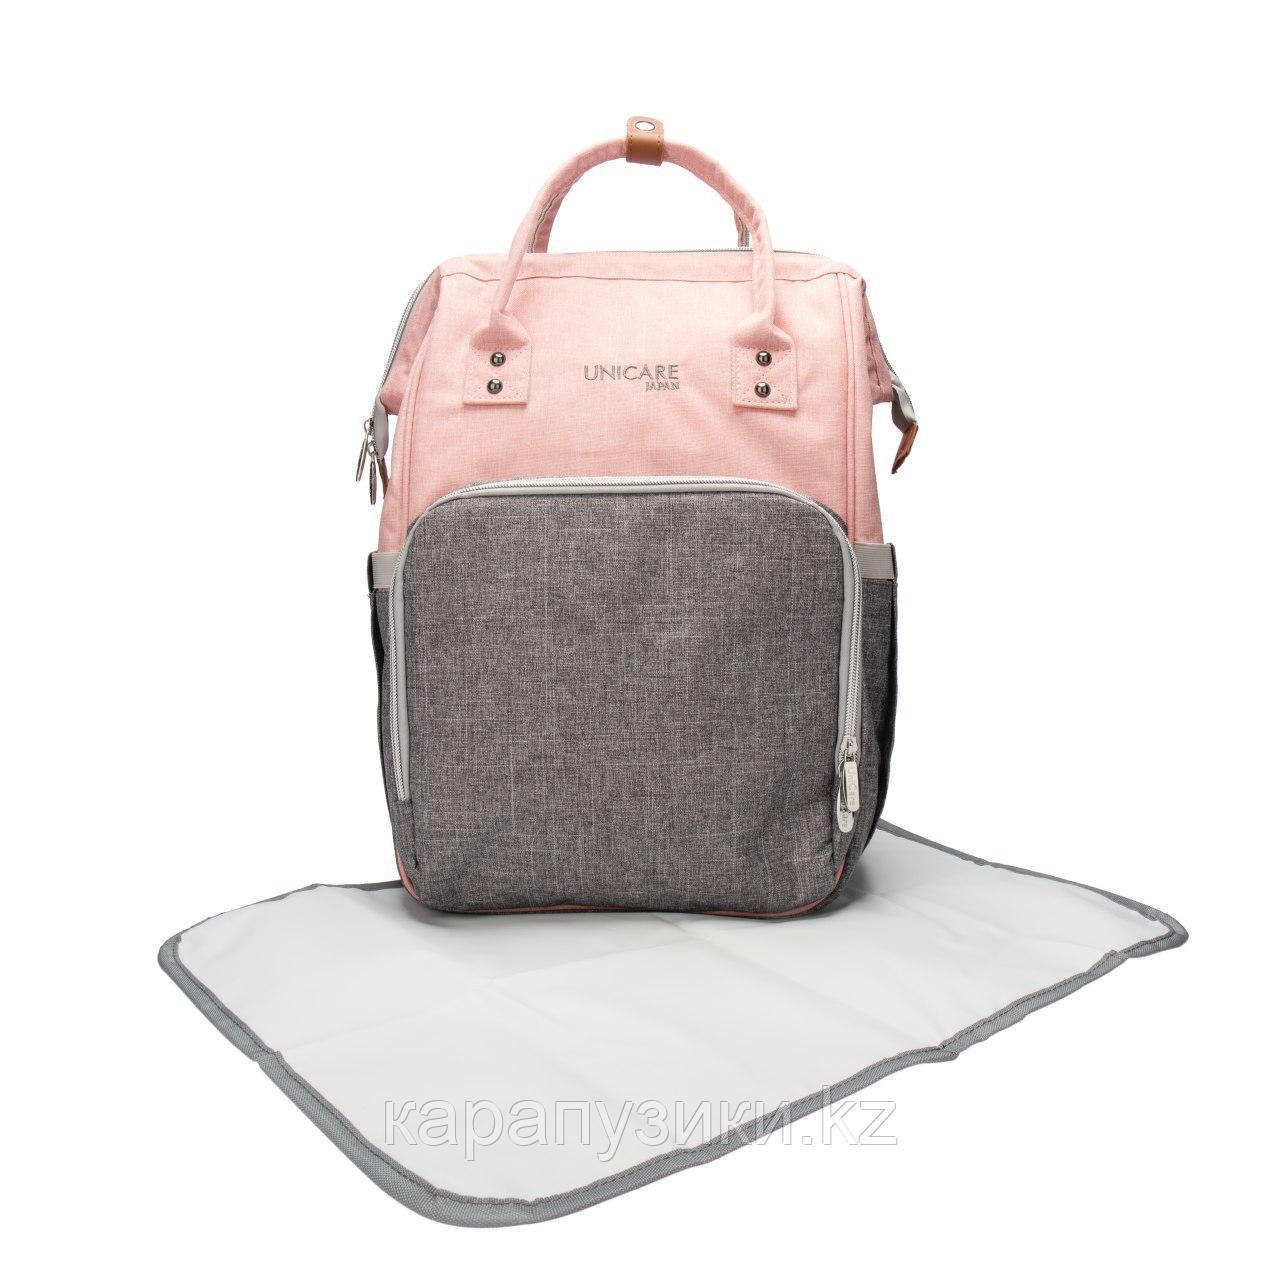 Рюкзак сумка  для мам UniCare Japan Osaka